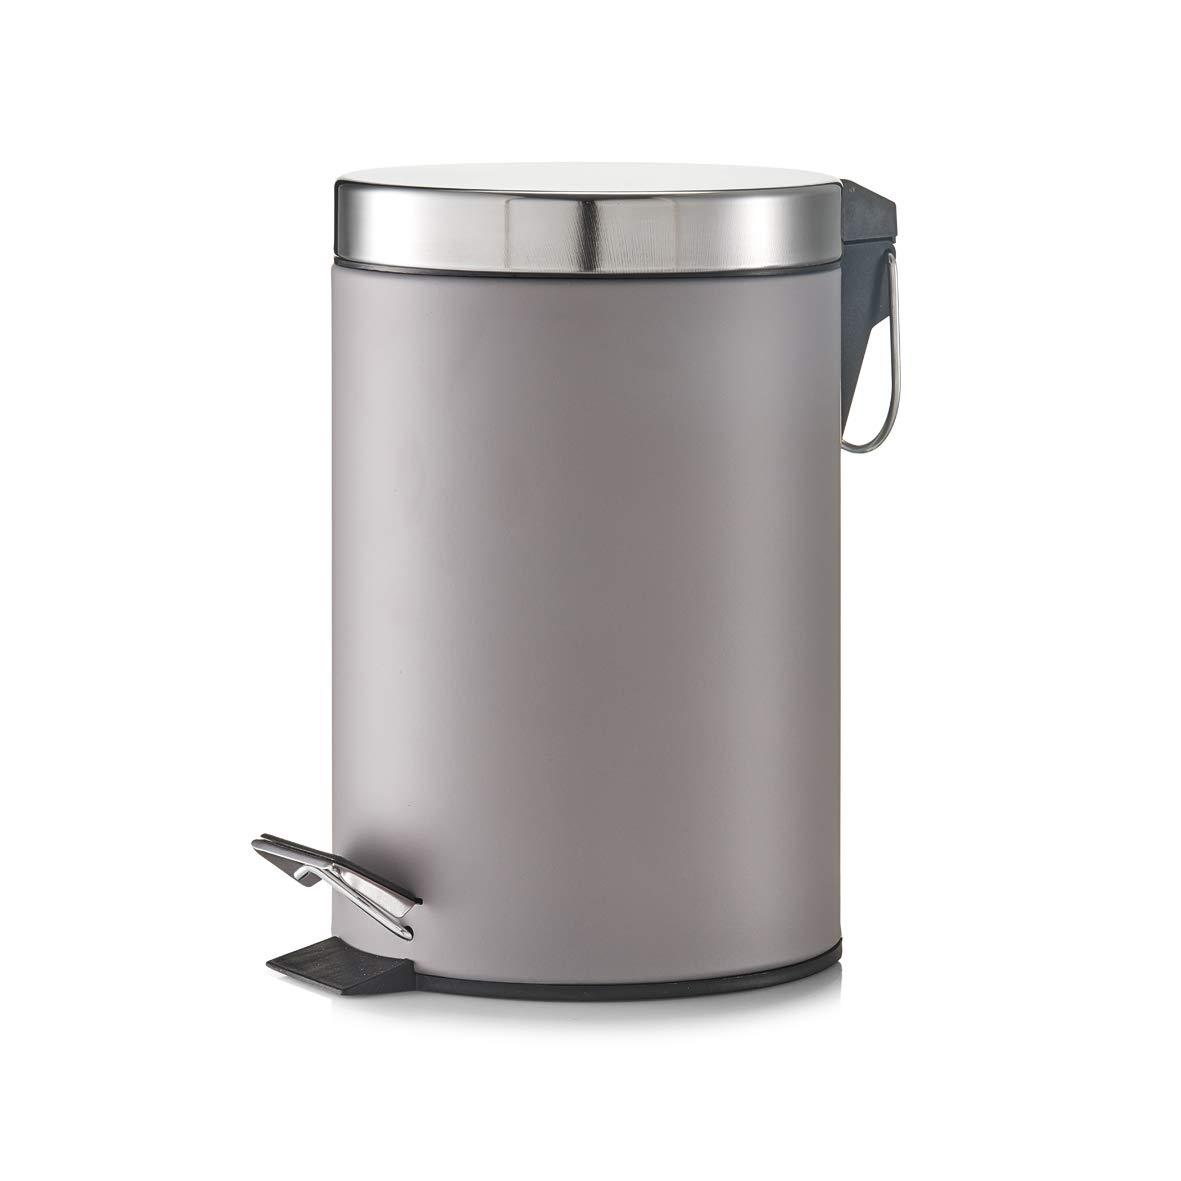 Zeller 18222 - Cubo de basura con pedal, ø17 cm, altura 26 cm, 3 litros, color gris oscuro metalizado: Amazon.es: Hogar